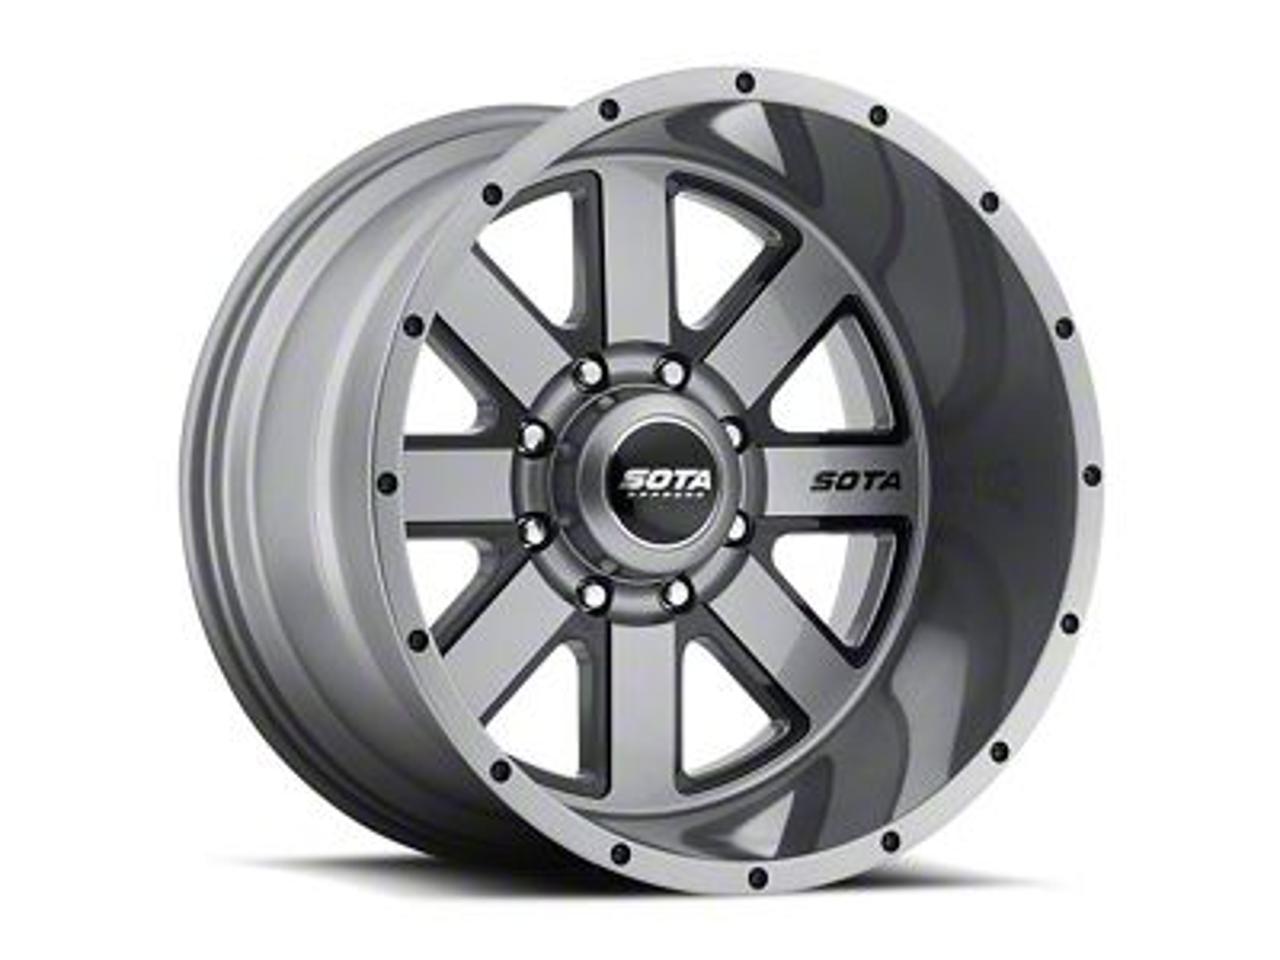 SOTA Off Road A.W.O.L. Anthra-Kote Black 8-Lug Wheel - 20x10 (06-08 RAM 1500 Mega Cab)